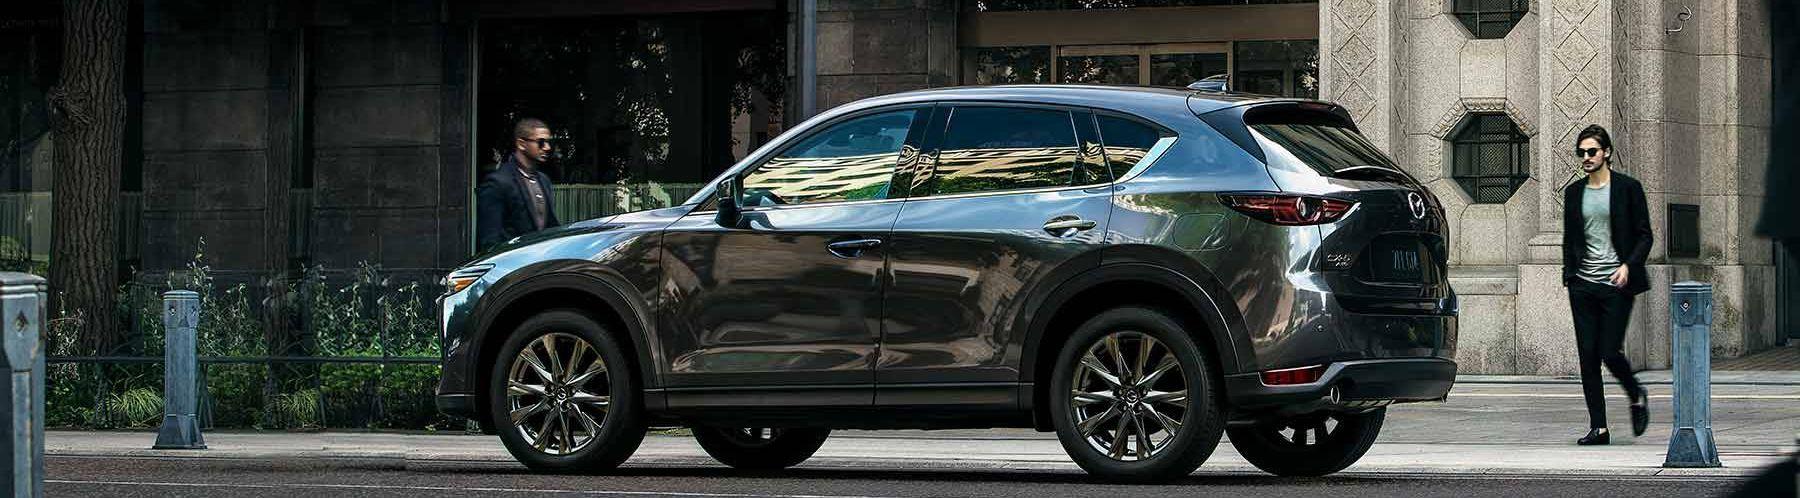 2019 Mazda CX-5 Leasing near Phoenix, AZ